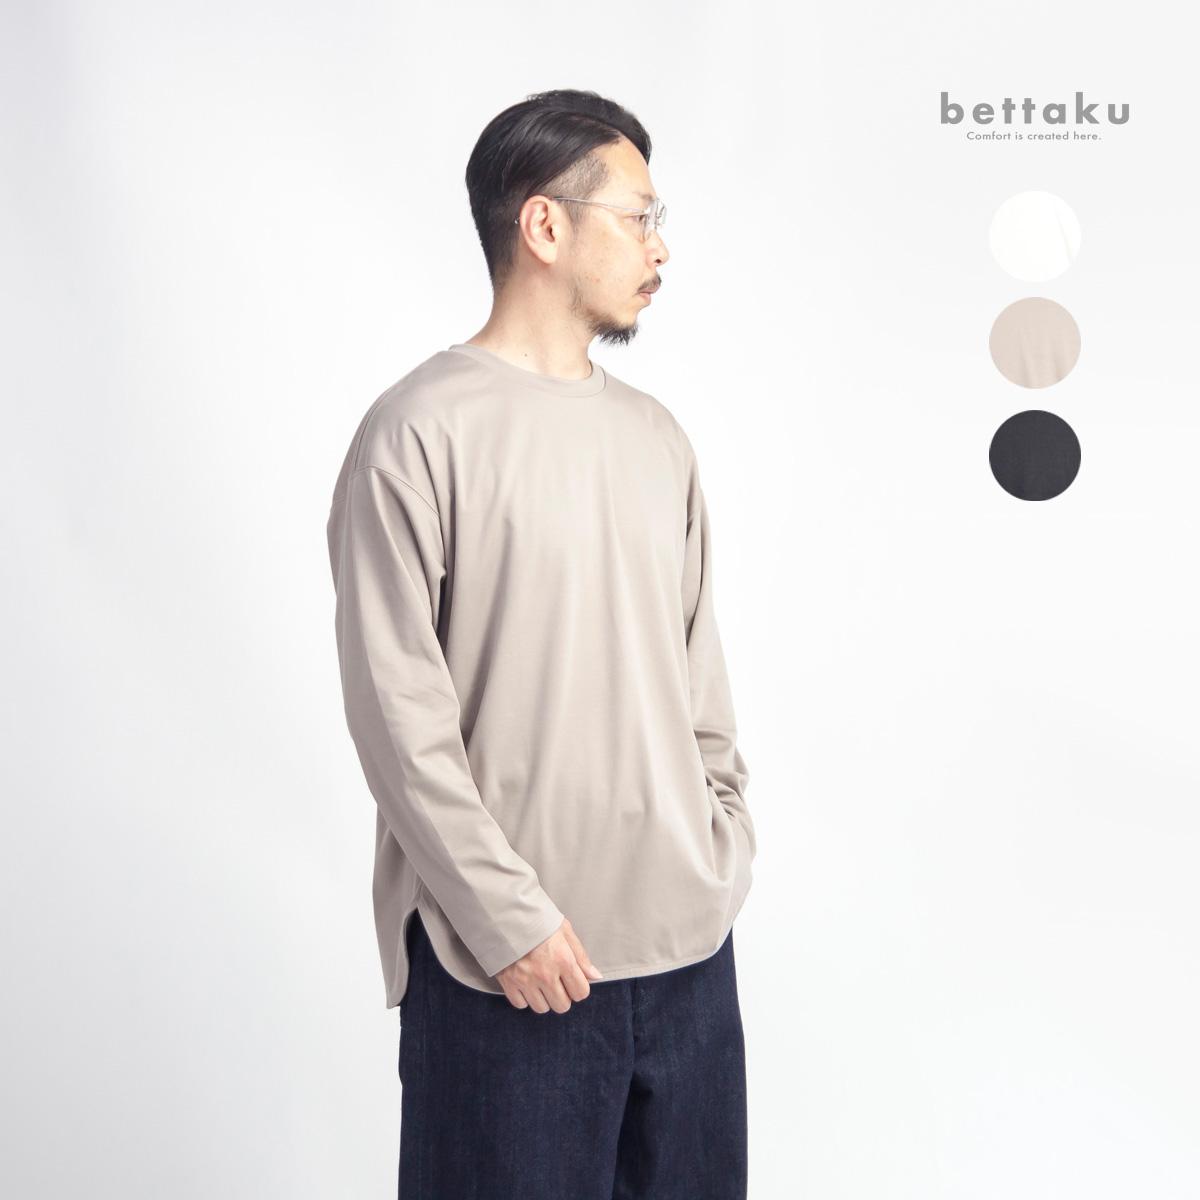 Bettaku ベッタク コンパクト天竺 3タック長袖Tシャツ 日本製 メンズ